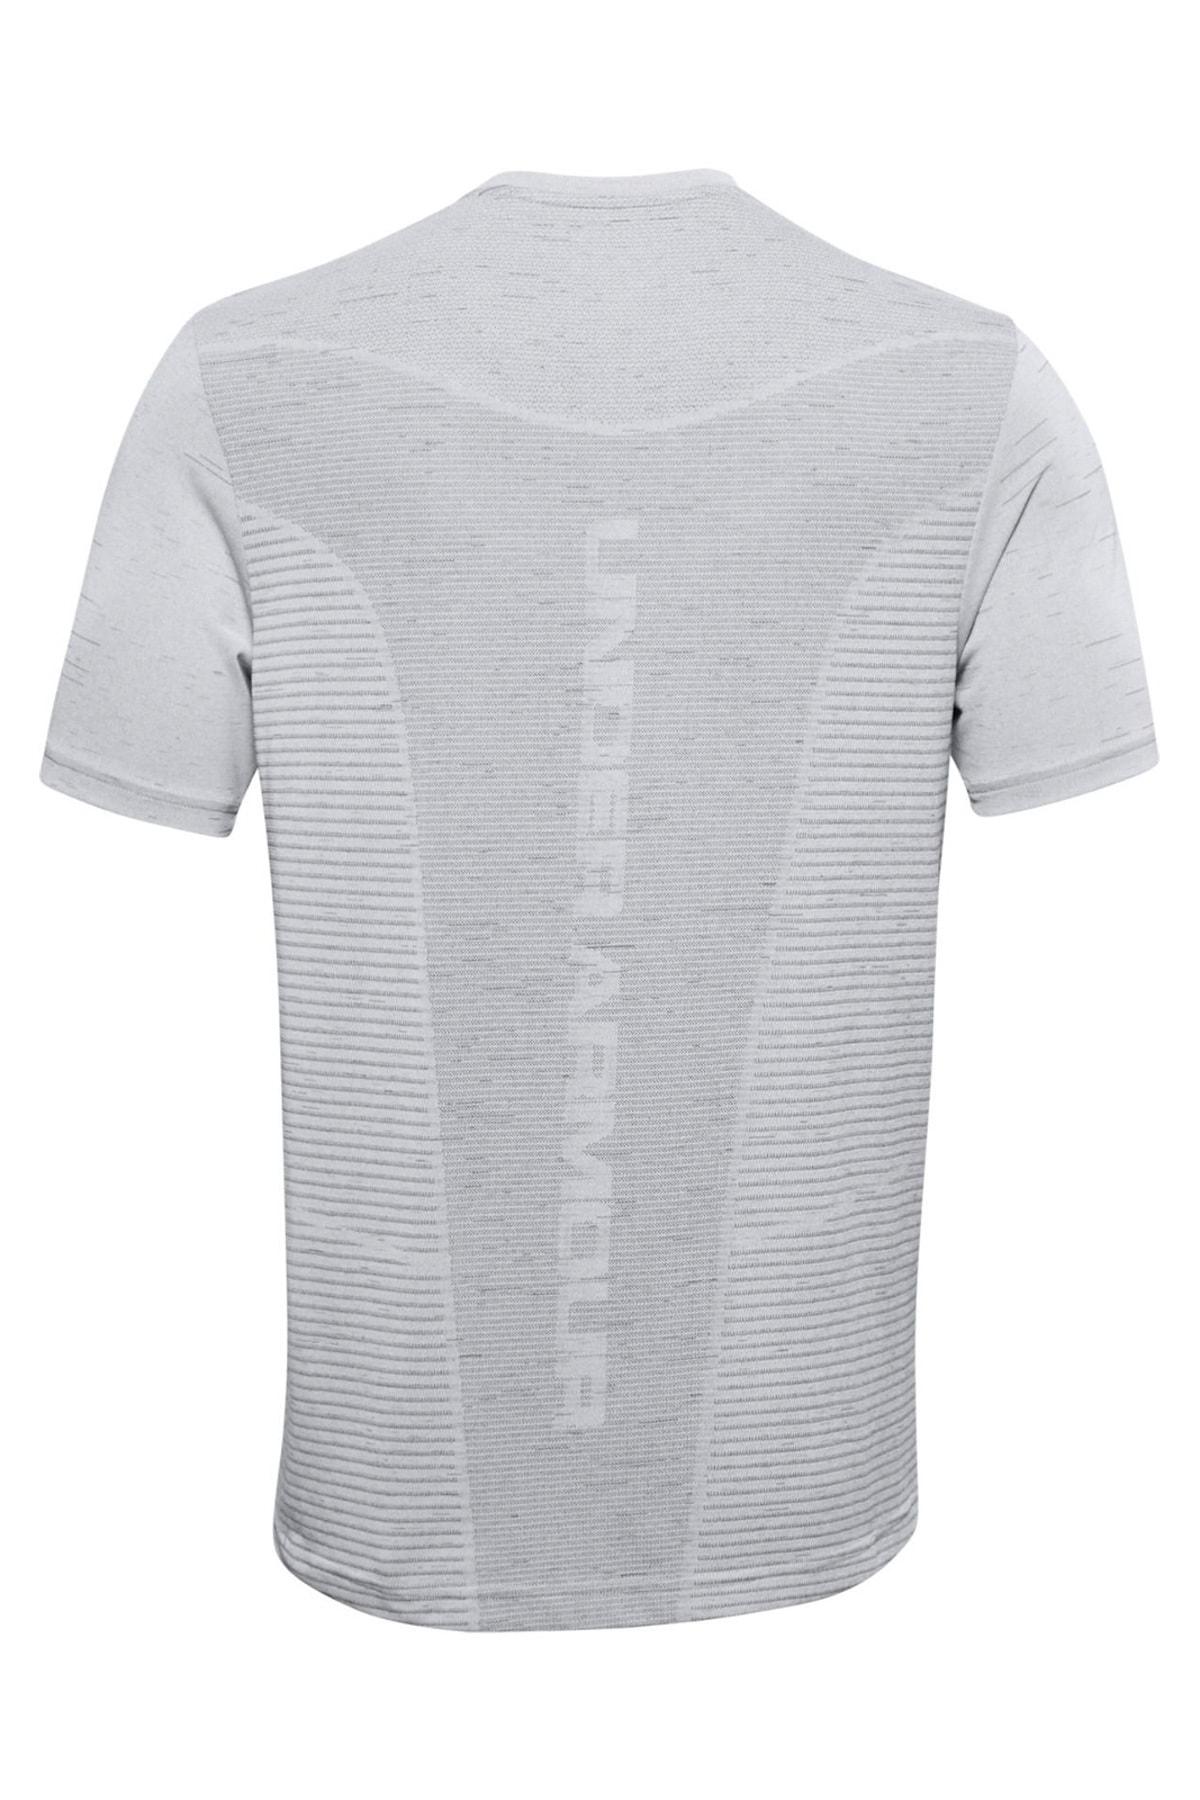 Under Armour Erkek Spor T-Shirt - Ua Seamless Logo Ss - 1356798-014 2